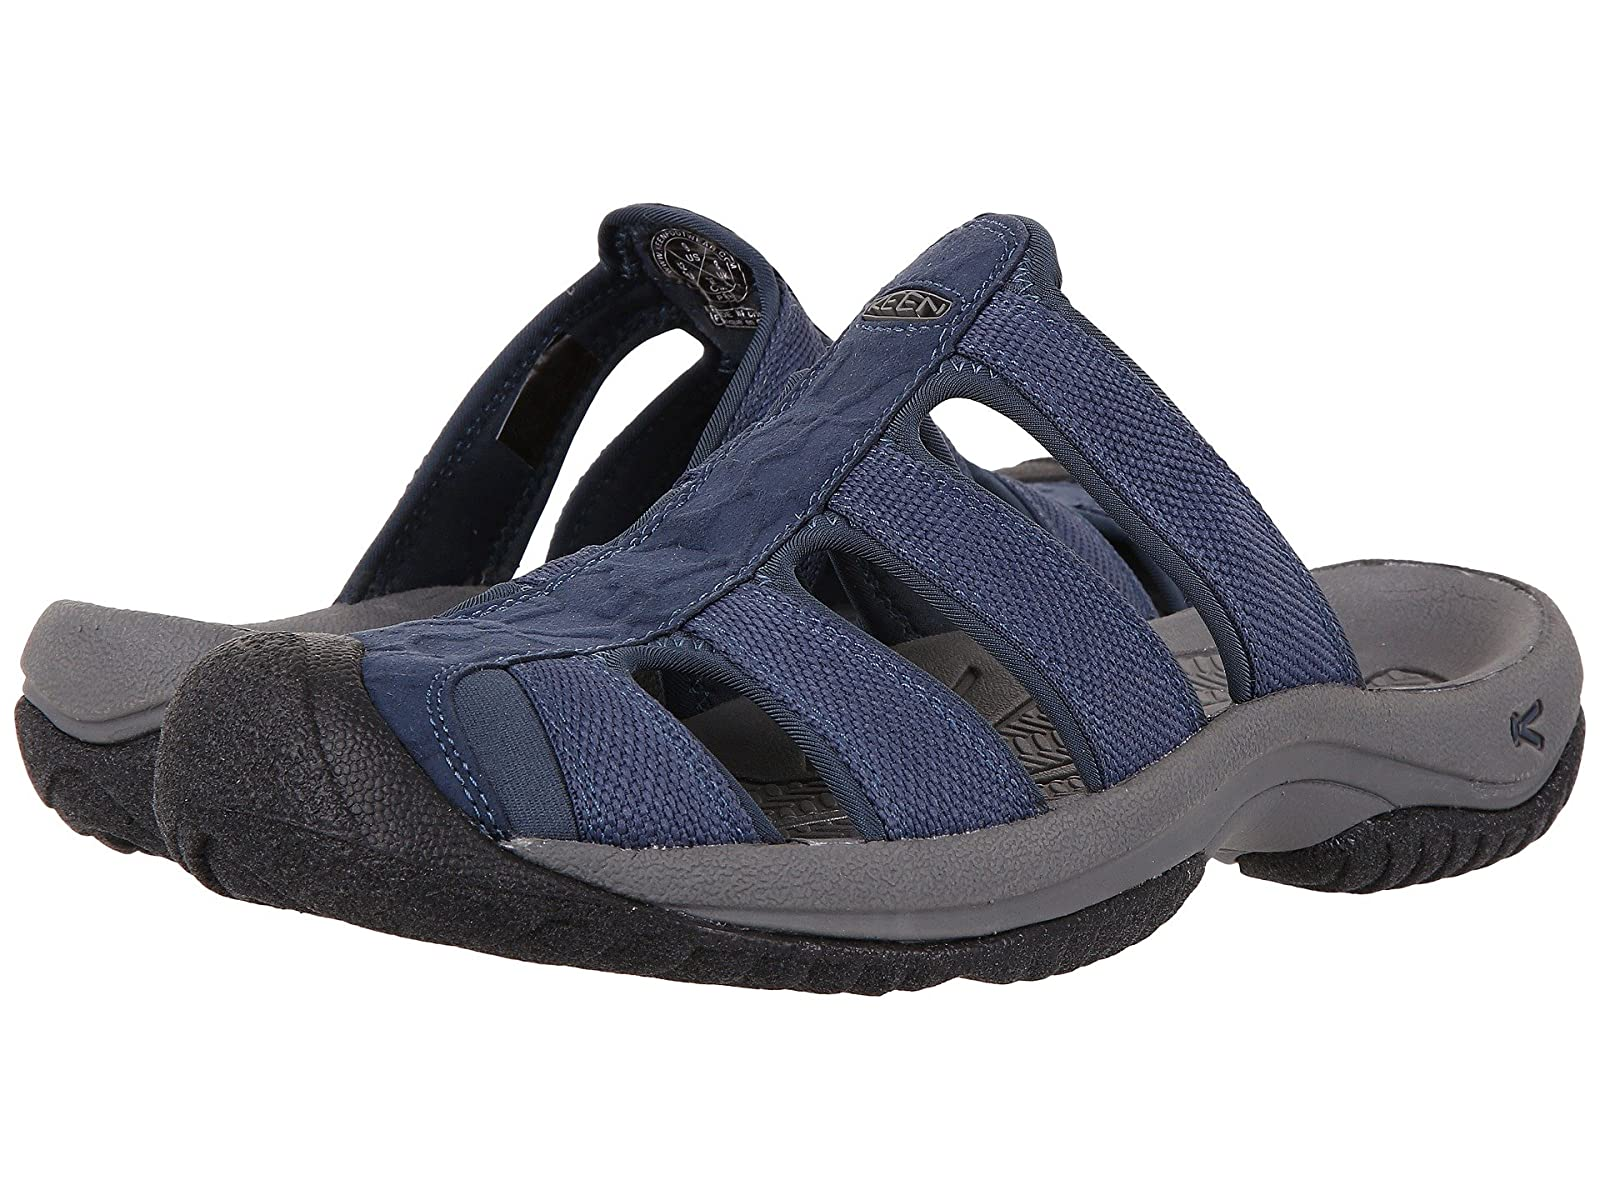 Keen Aruba IIAtmospheric grades have affordable shoes